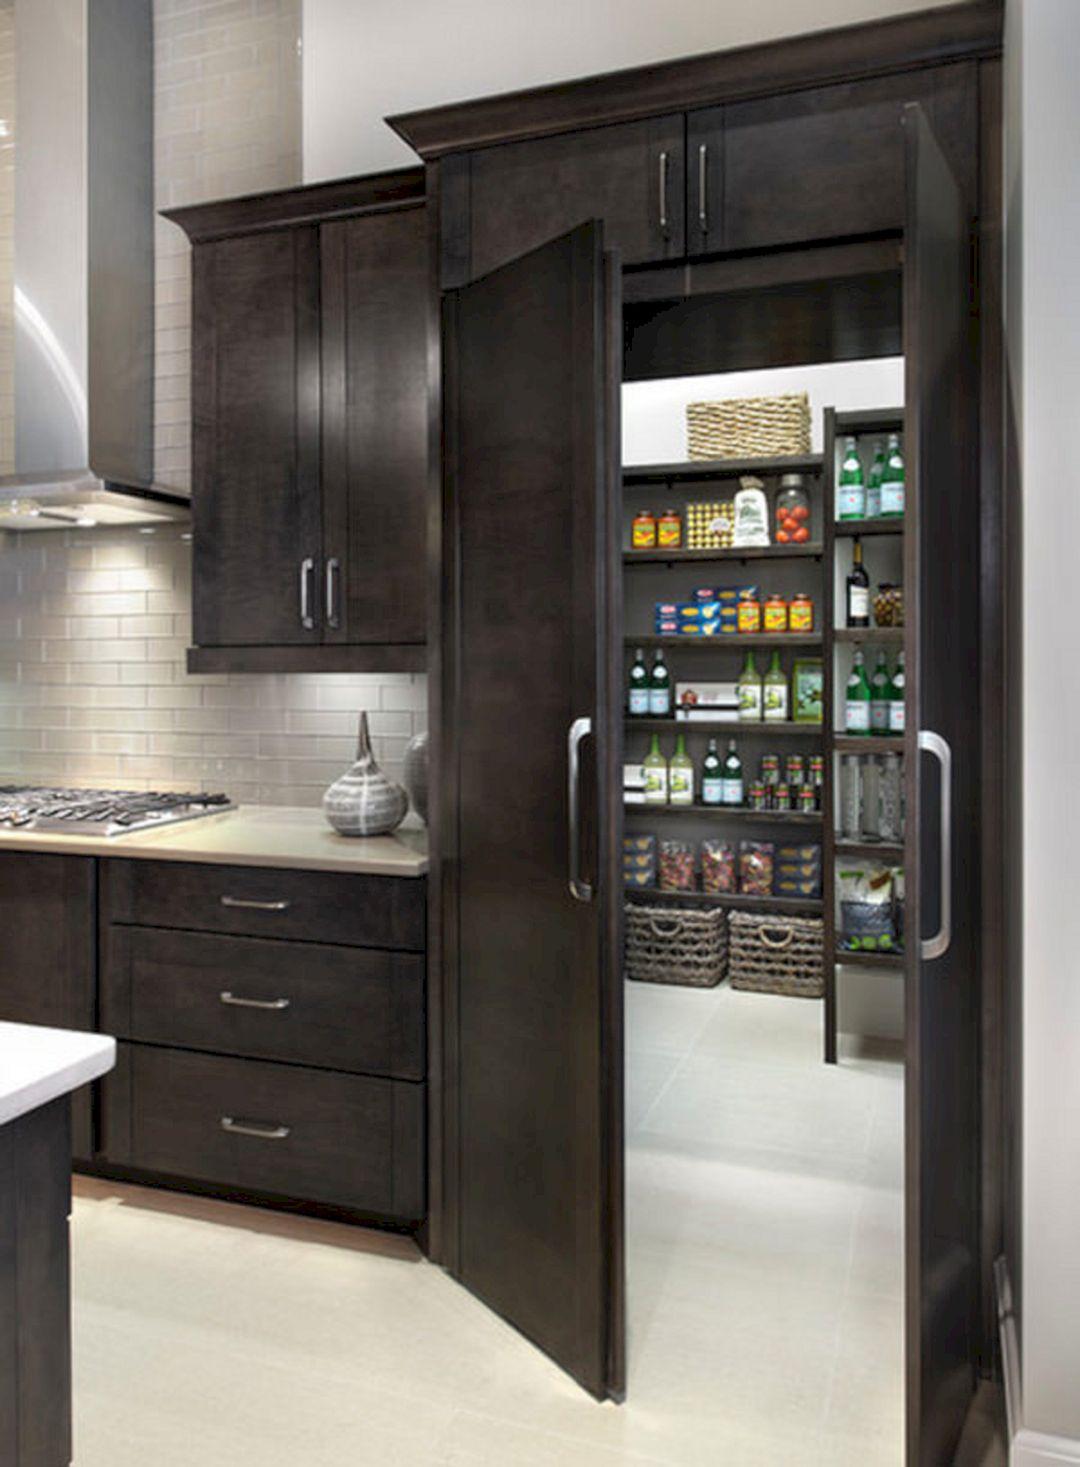 hidden kitchen pantry room (hidden kitchen pantry room) design ideas and photos